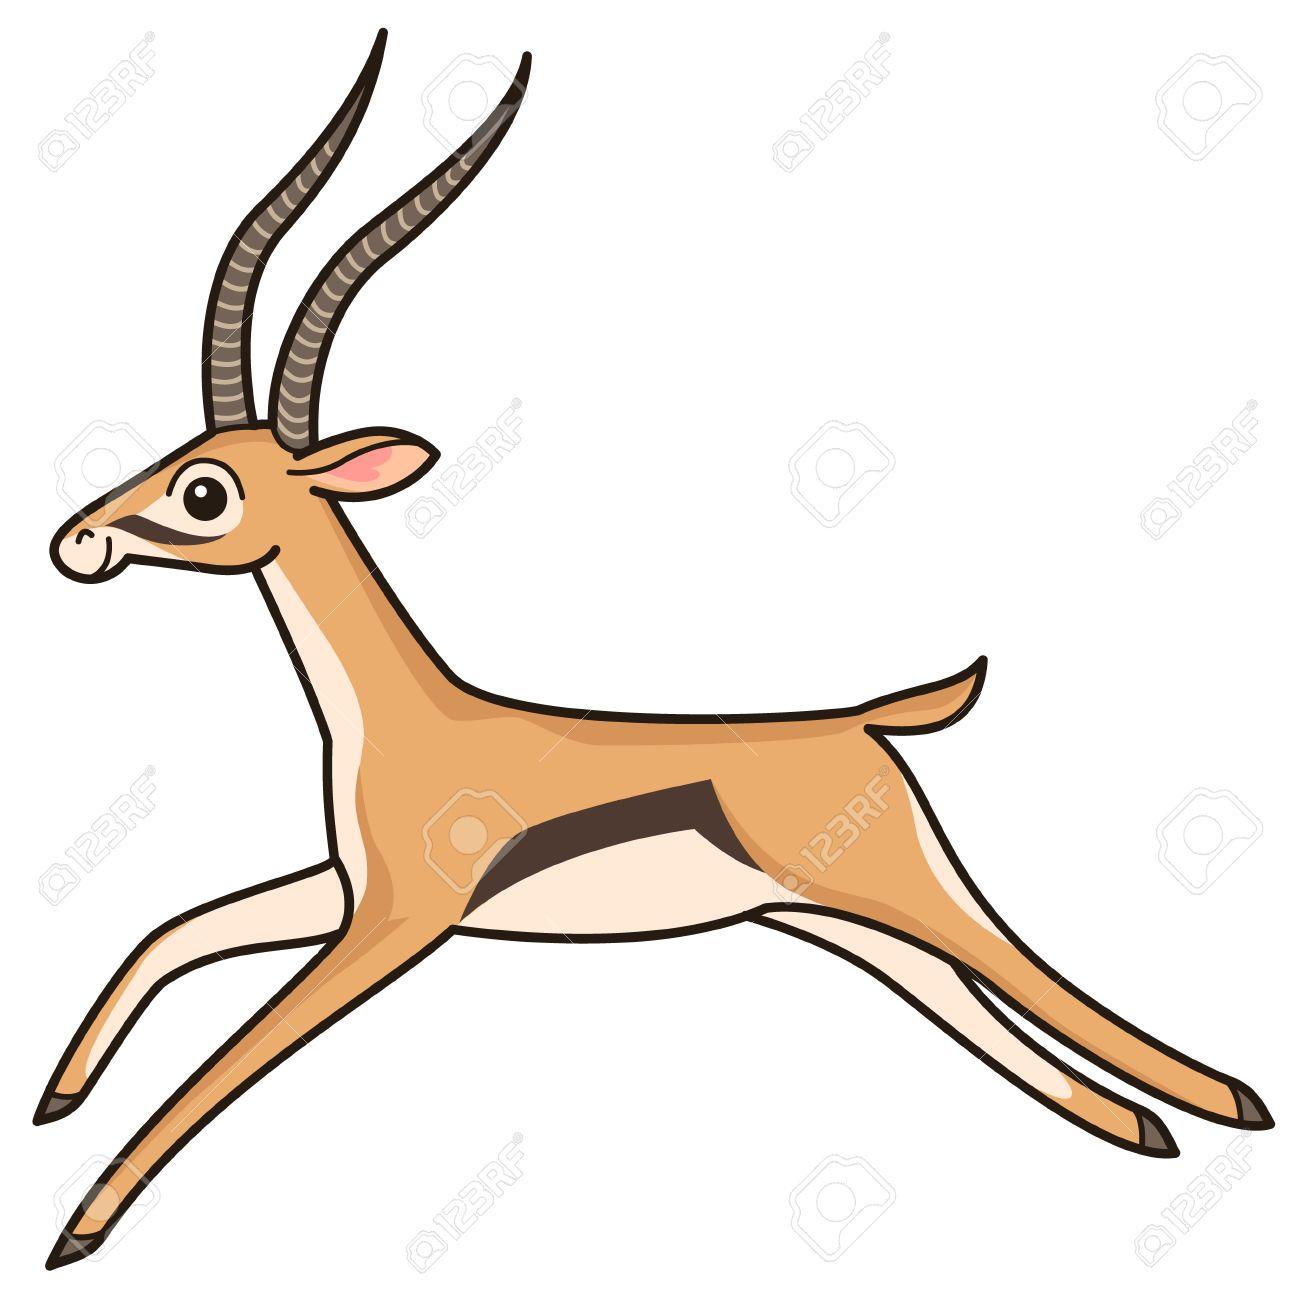 cartoon character running antelope isolated on white background rh 123rf com